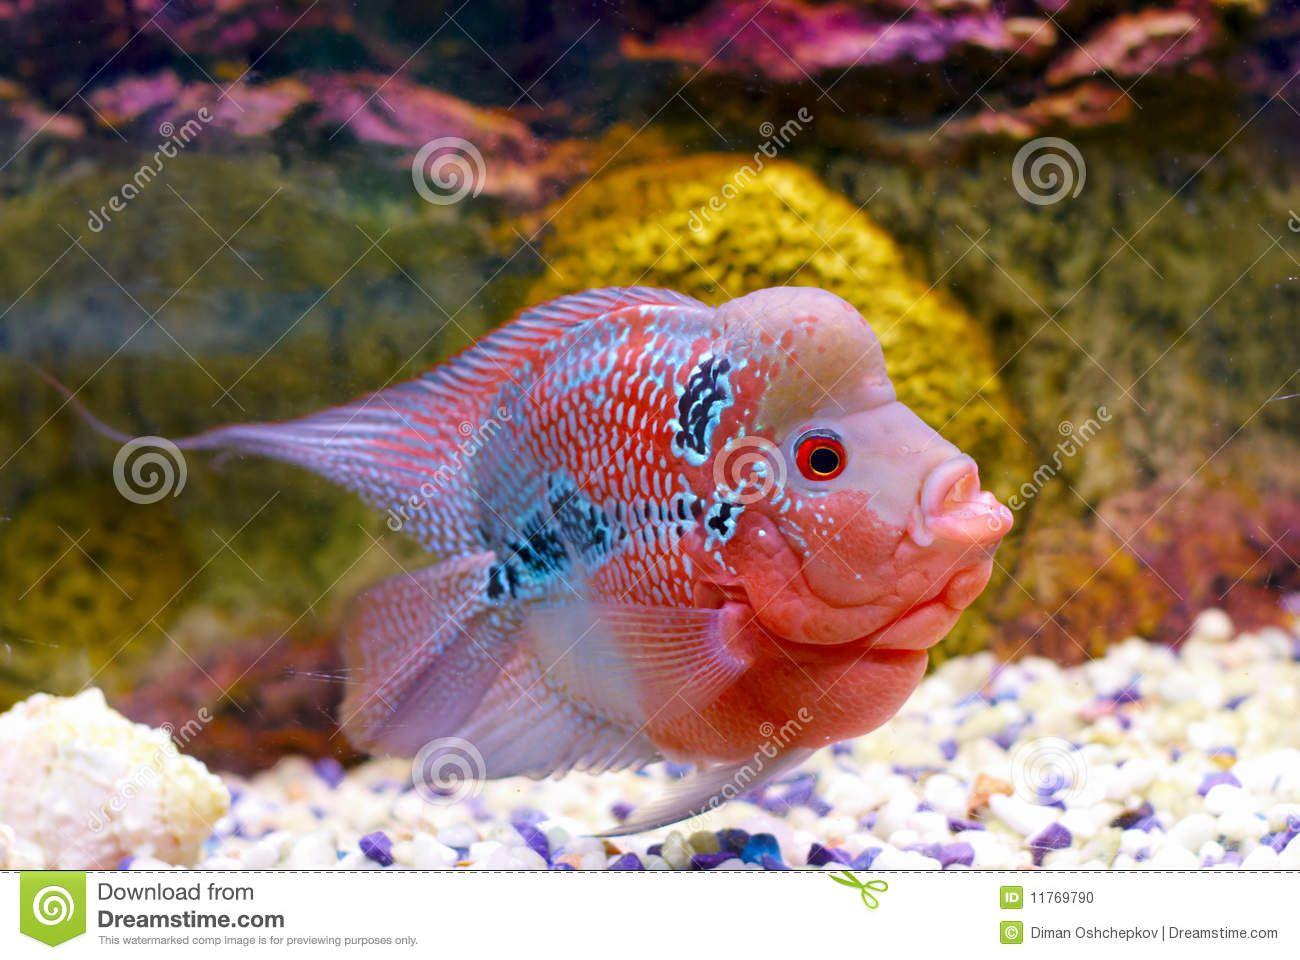 Flowerhorn Cichlid fish stock photo. Image of deep, color